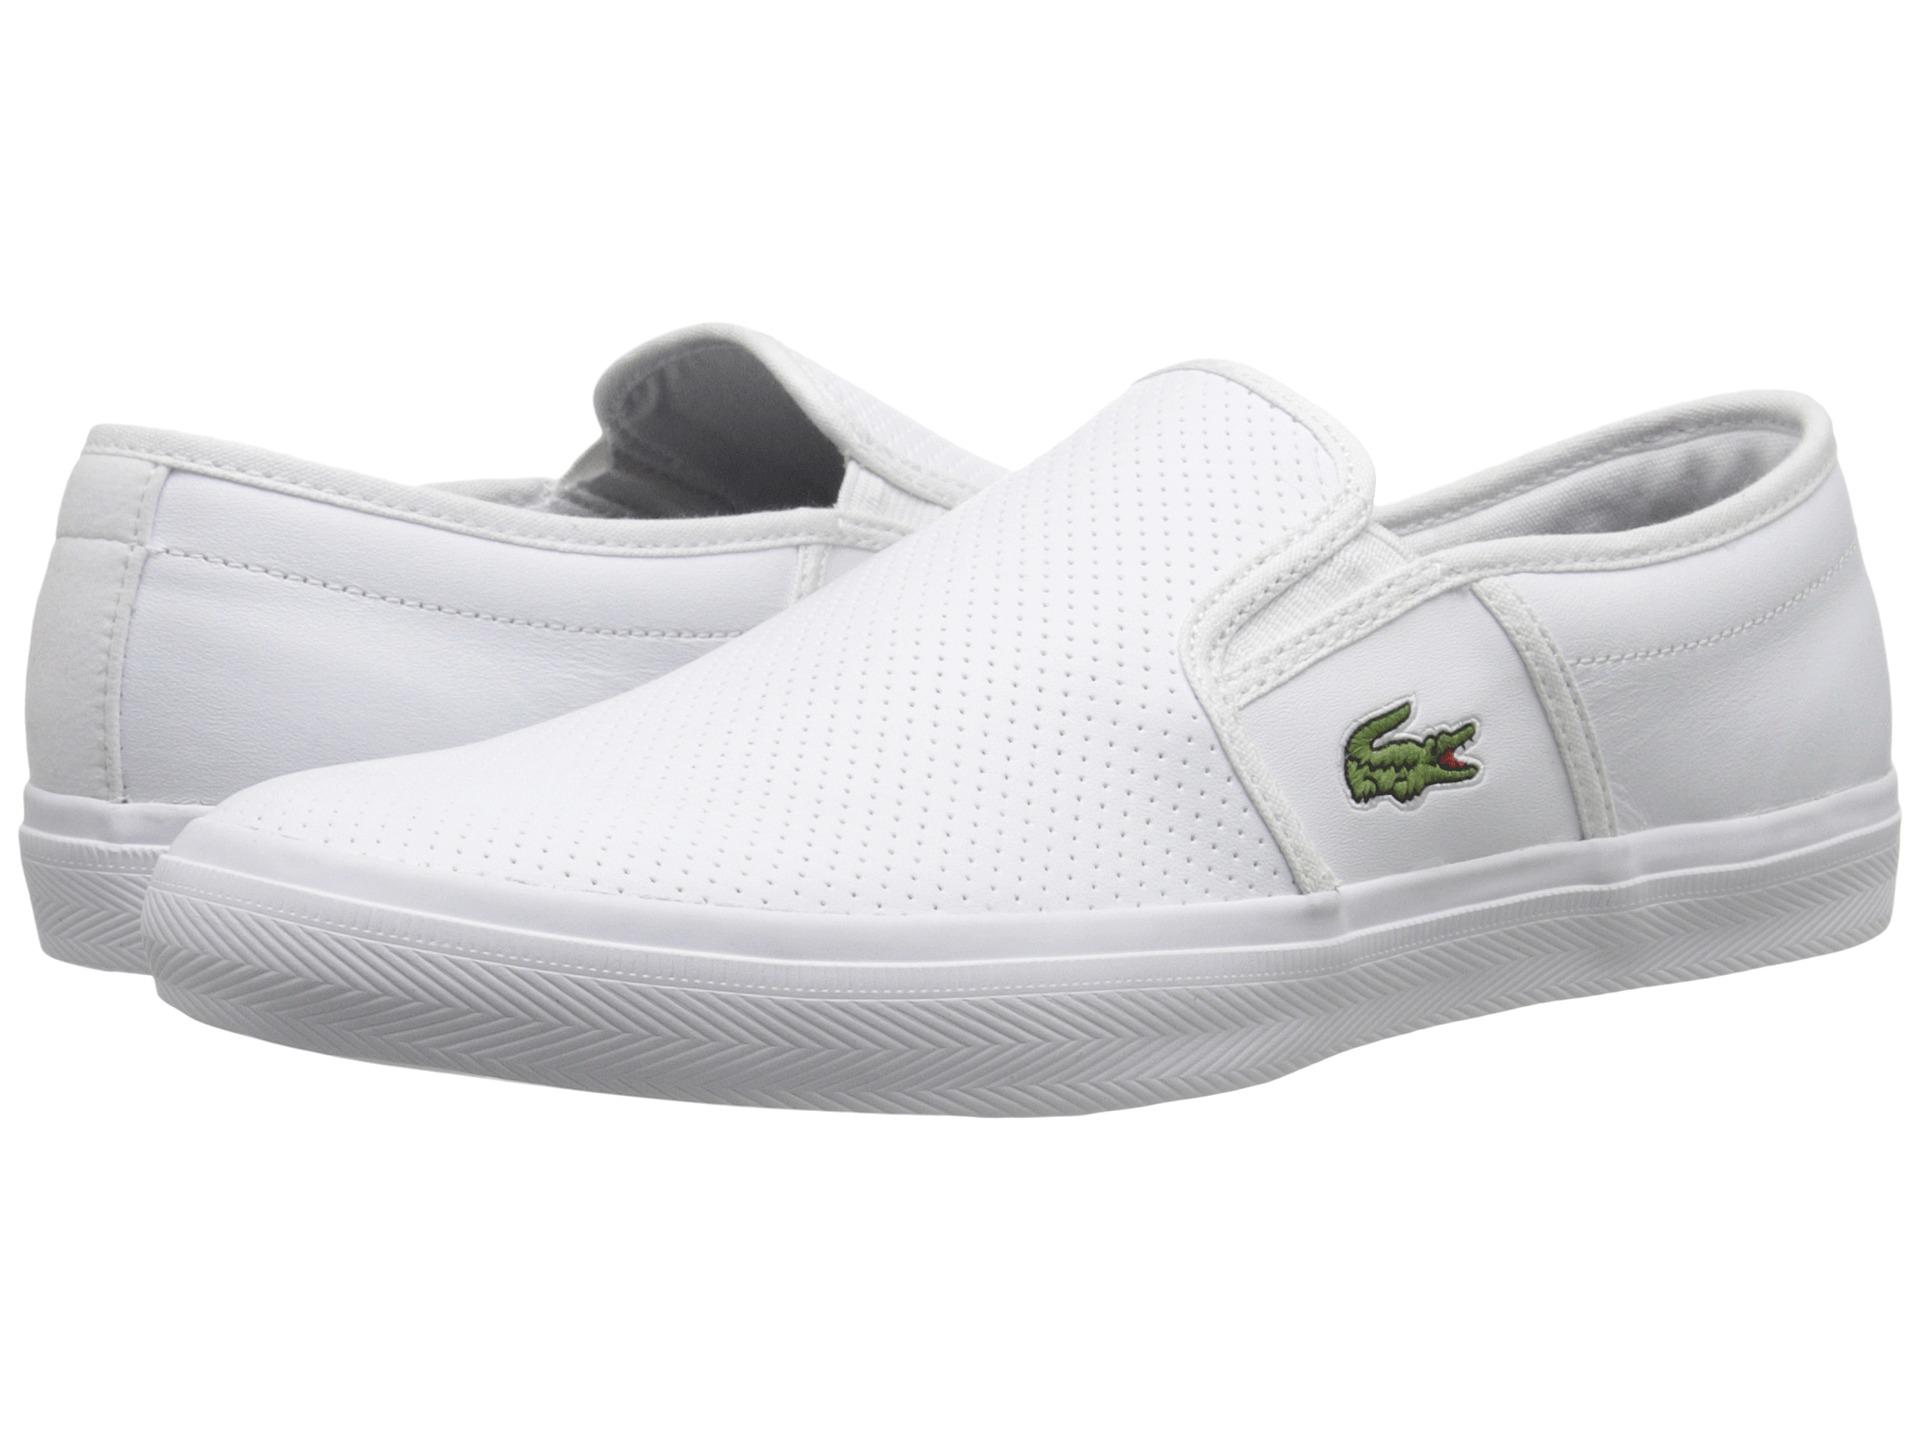 6ca6d59c5e1d89 Lyst - Lacoste Gazon Sport 116 2 in White for Men